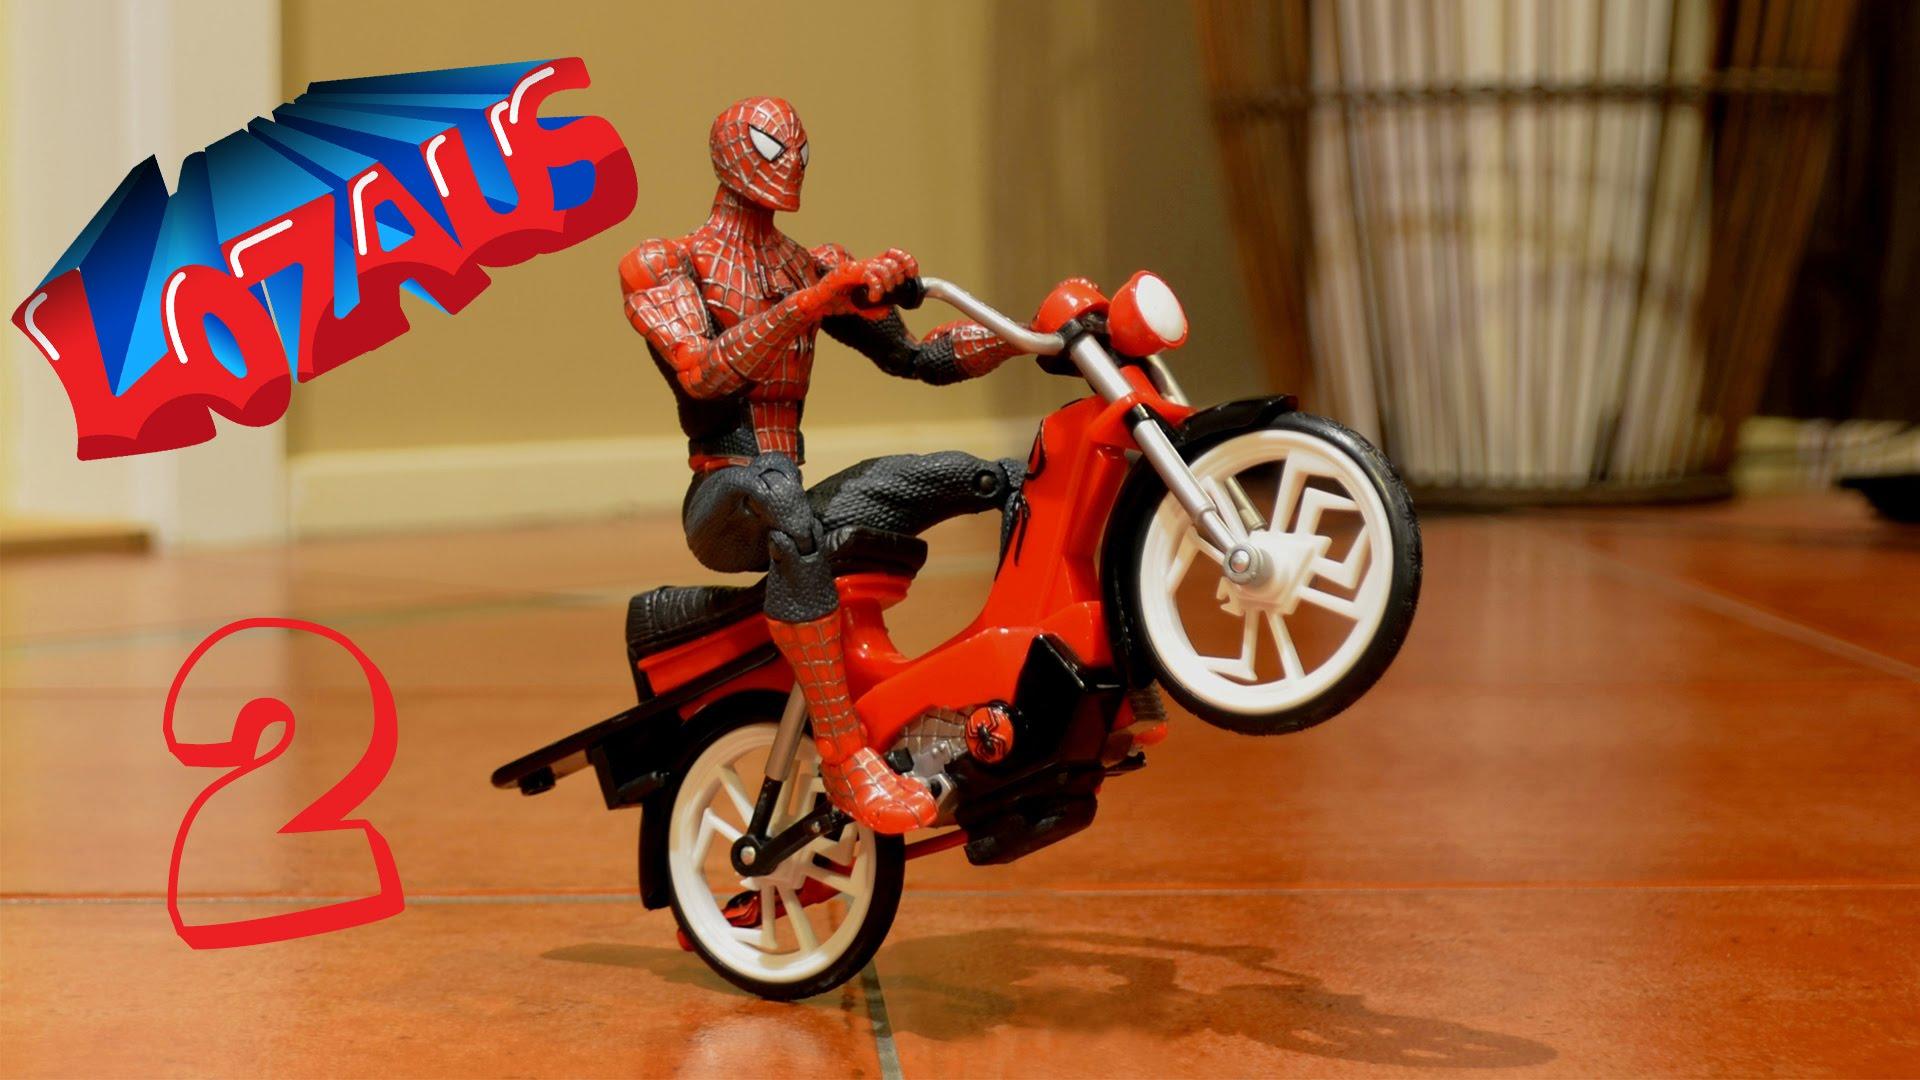 spiderman moto video